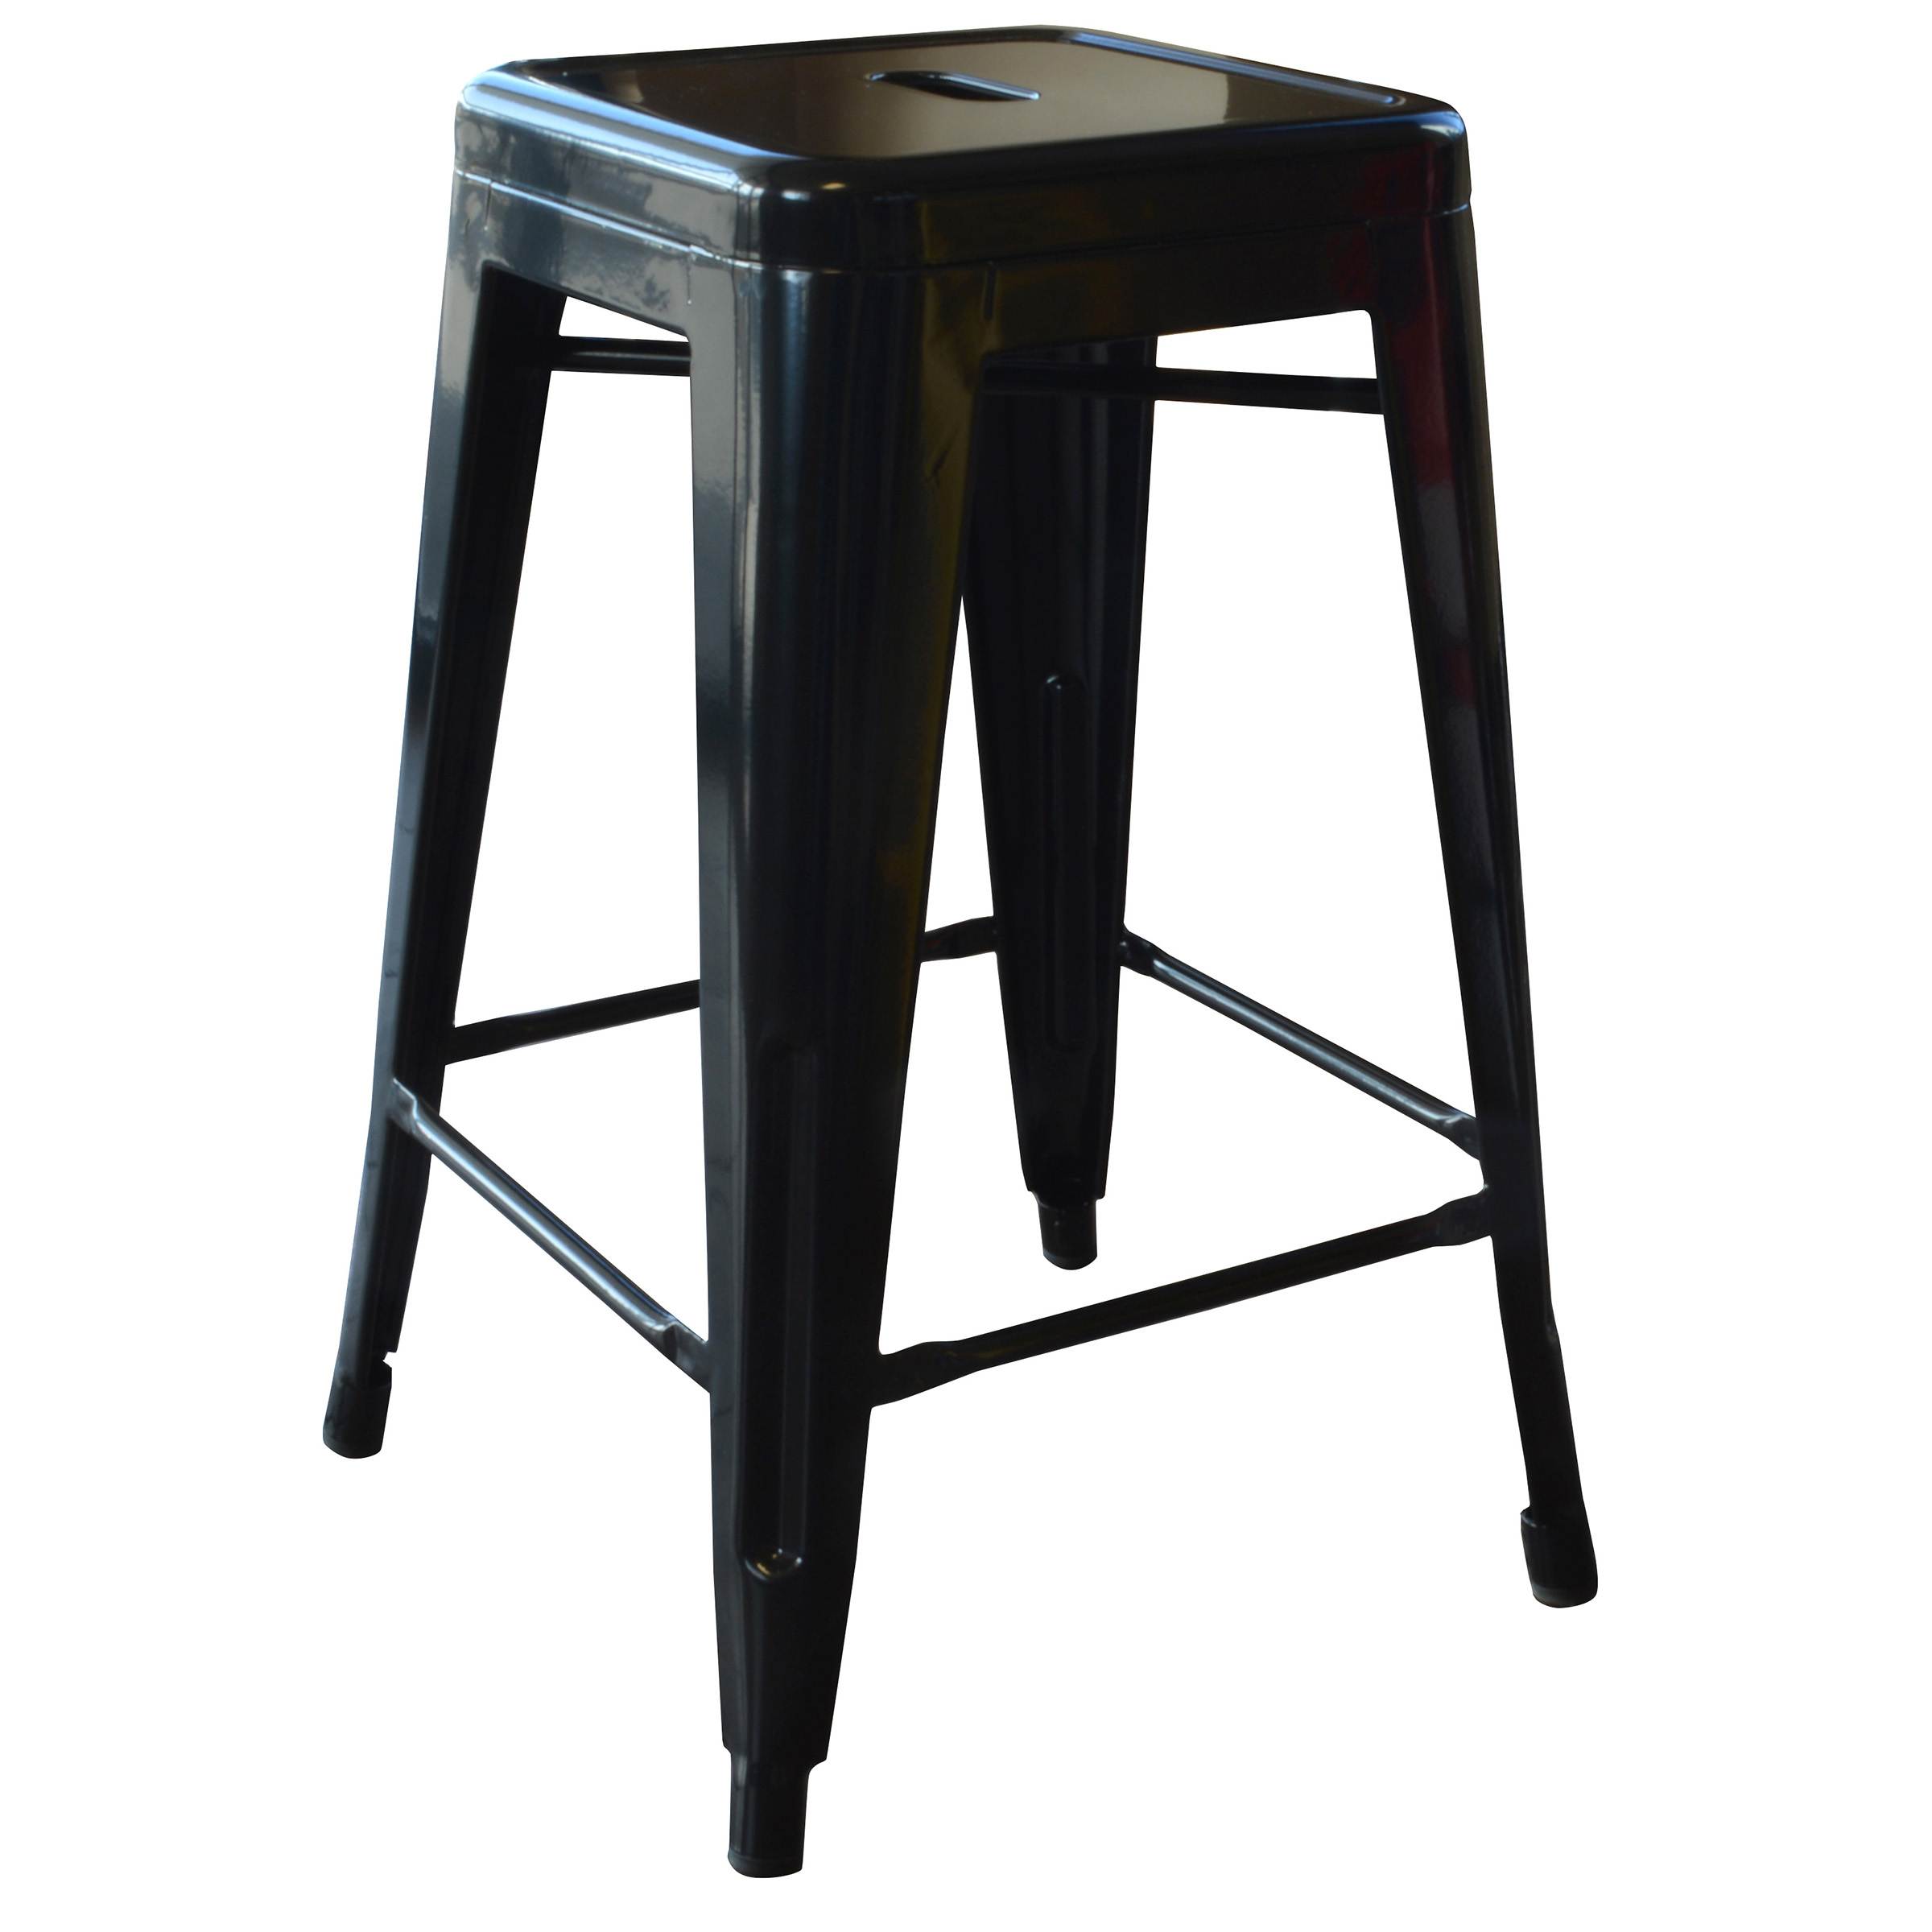 Amerihome Loft Black 24 Inch Metal Bar Stool 4 Piece